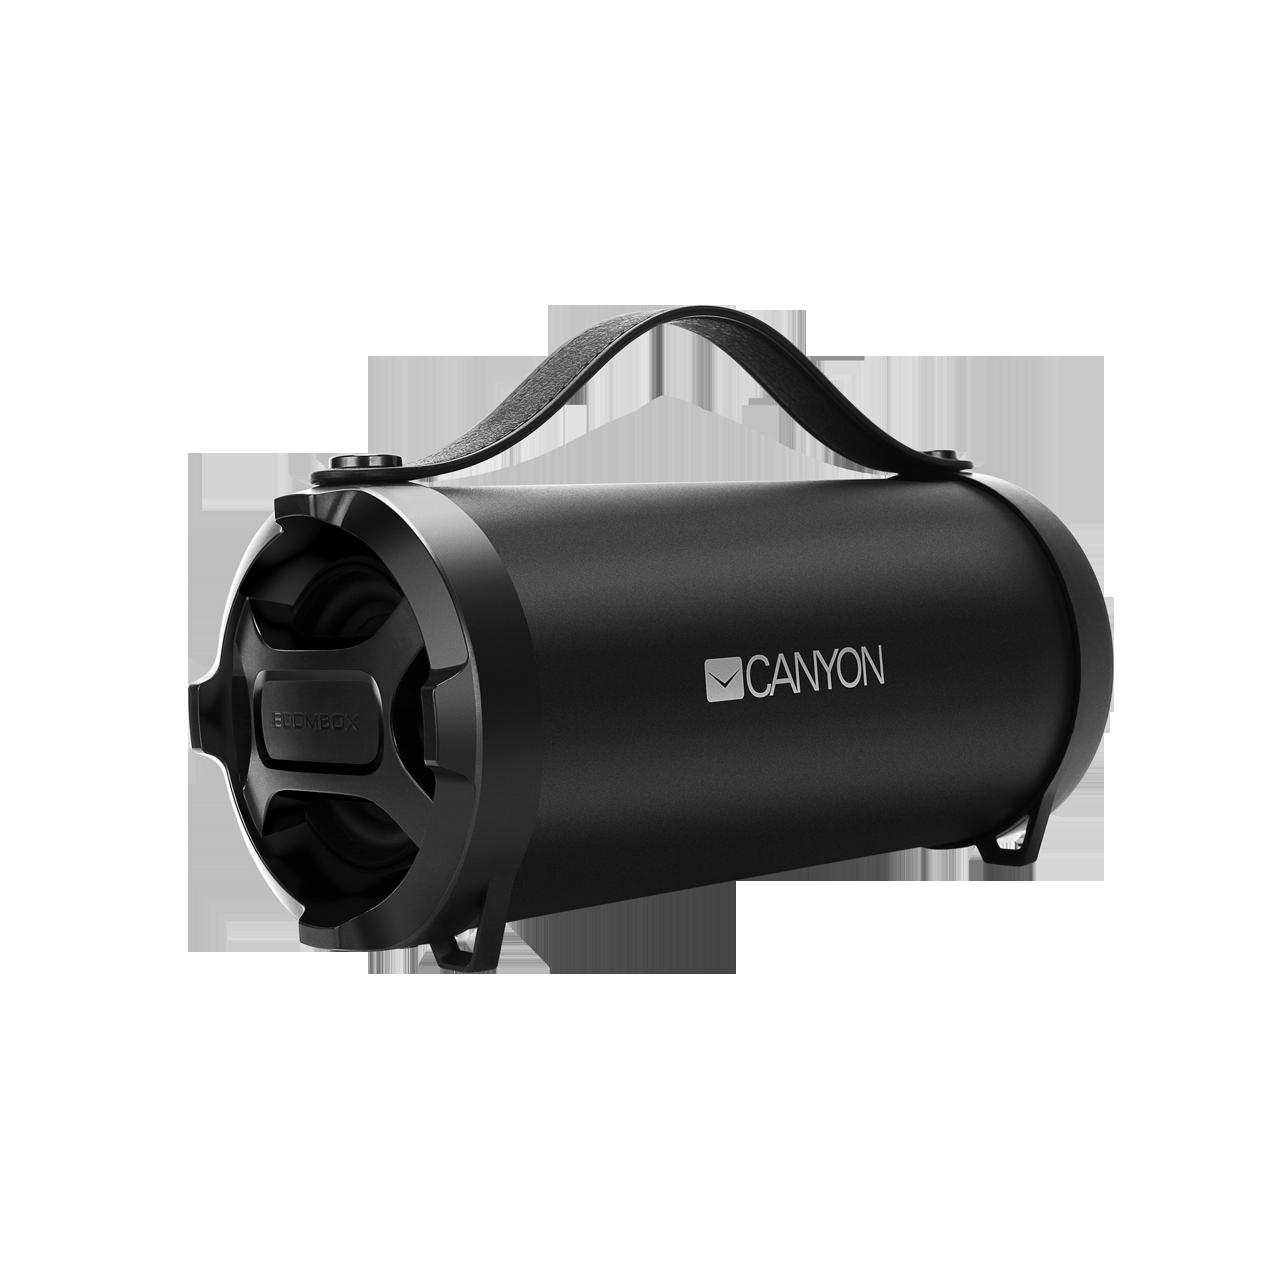 Wireless Speaker Canyon Black 10Wt / CNE-CBTSP6  - 2